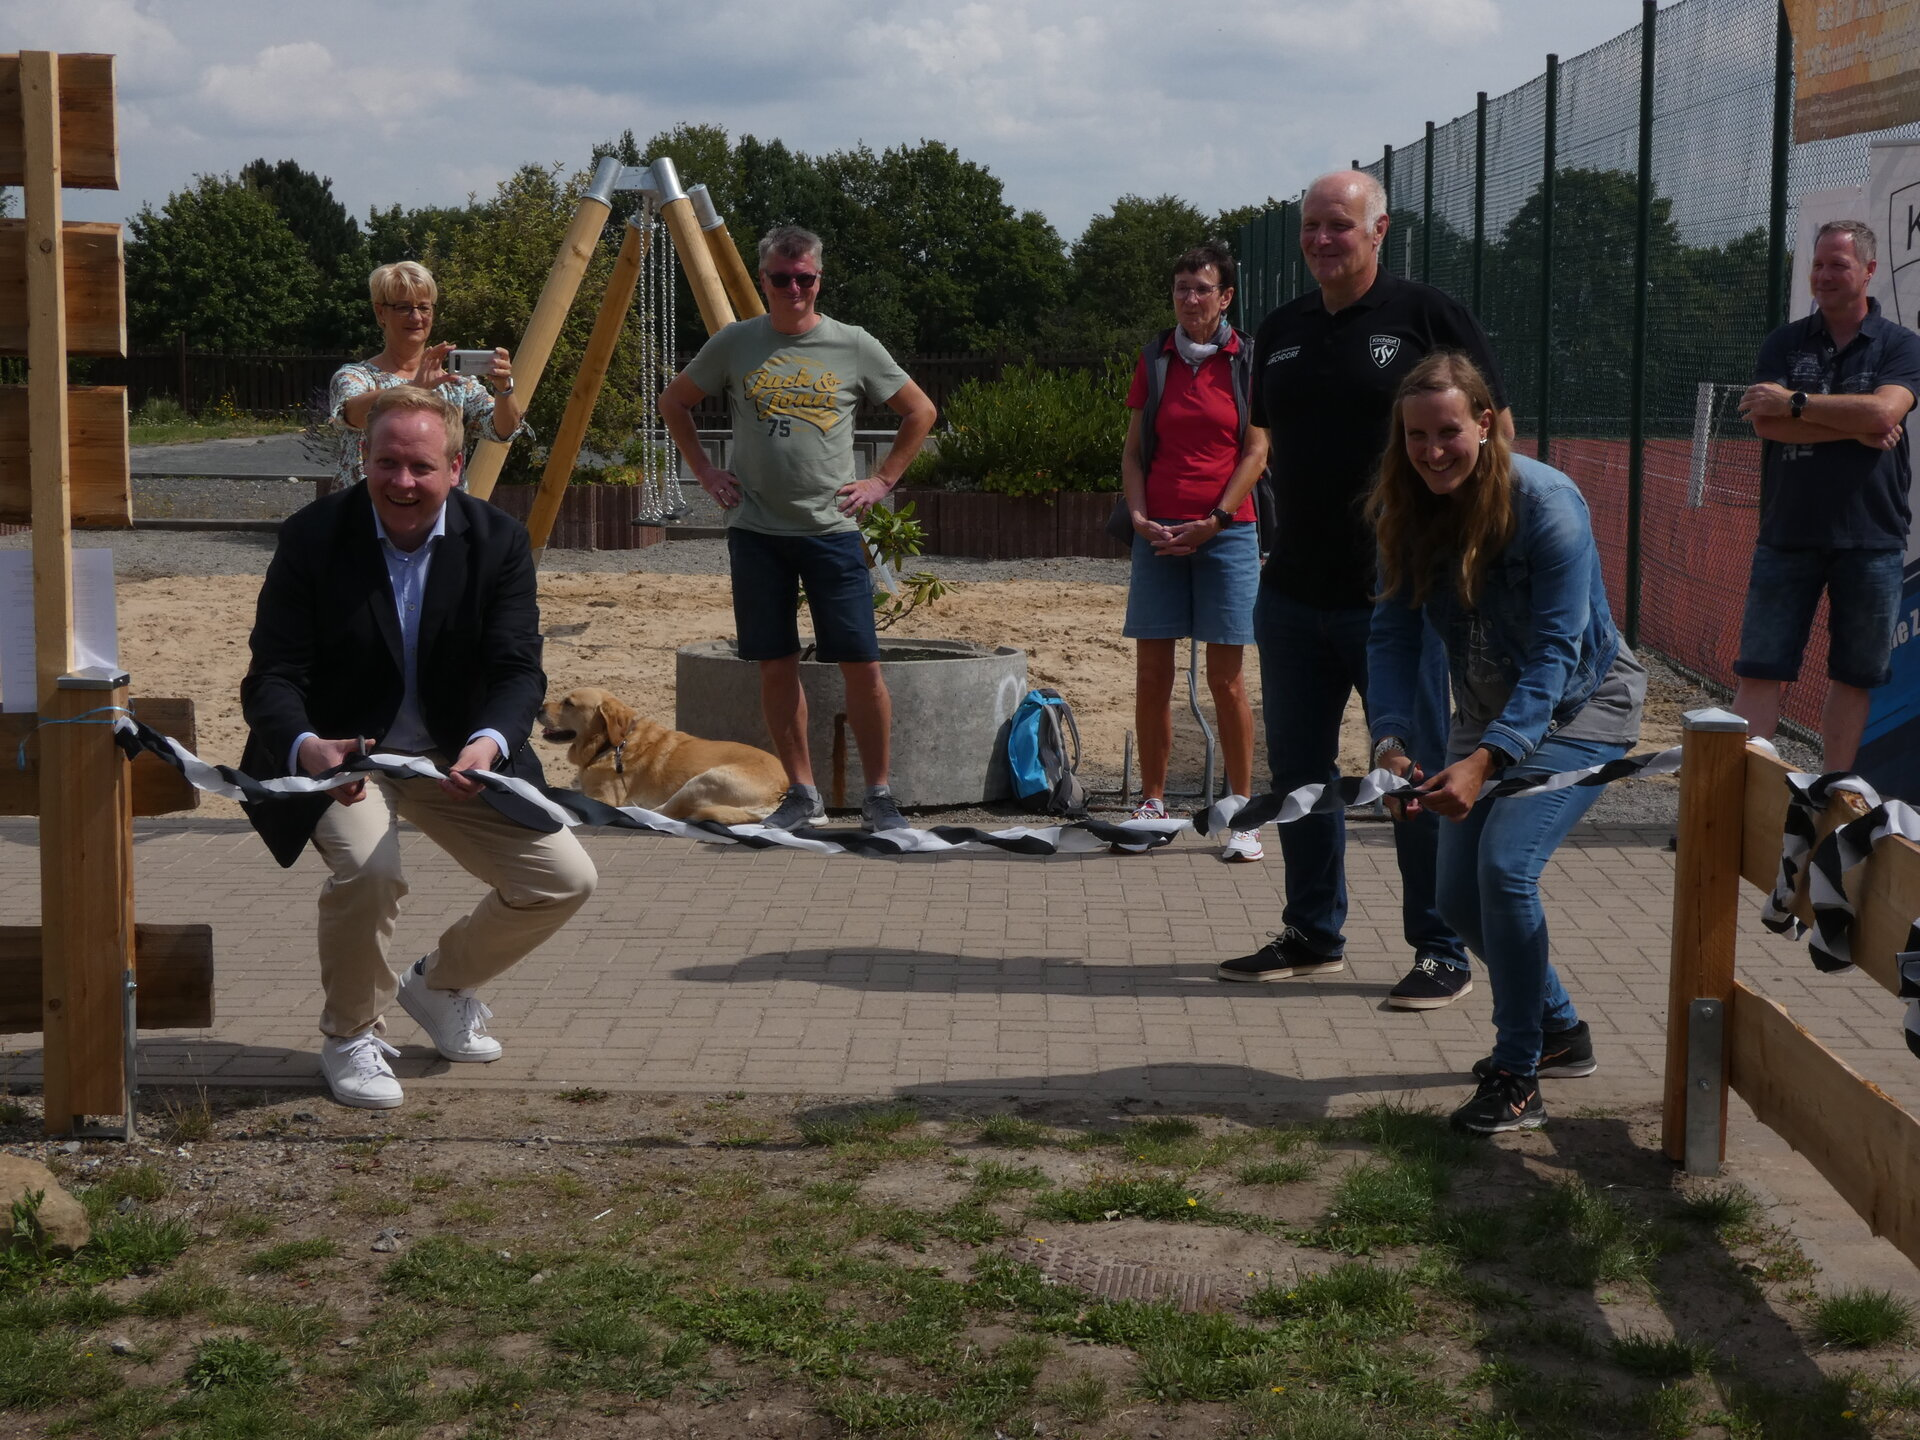 Carina Gdeczyk und Tilman Kuban eröffnen den Outdoor Fitness Park des TSV Kirchdorf